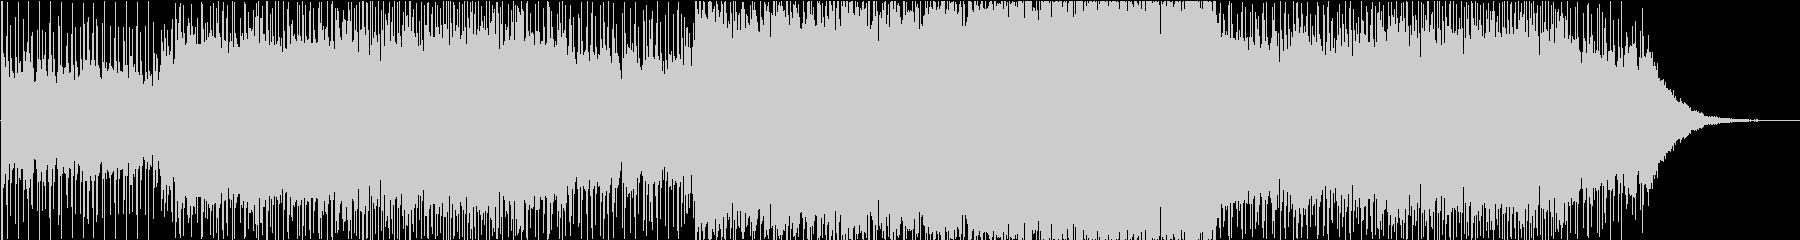 ACTのOPをイメージしたBGMの未再生の波形